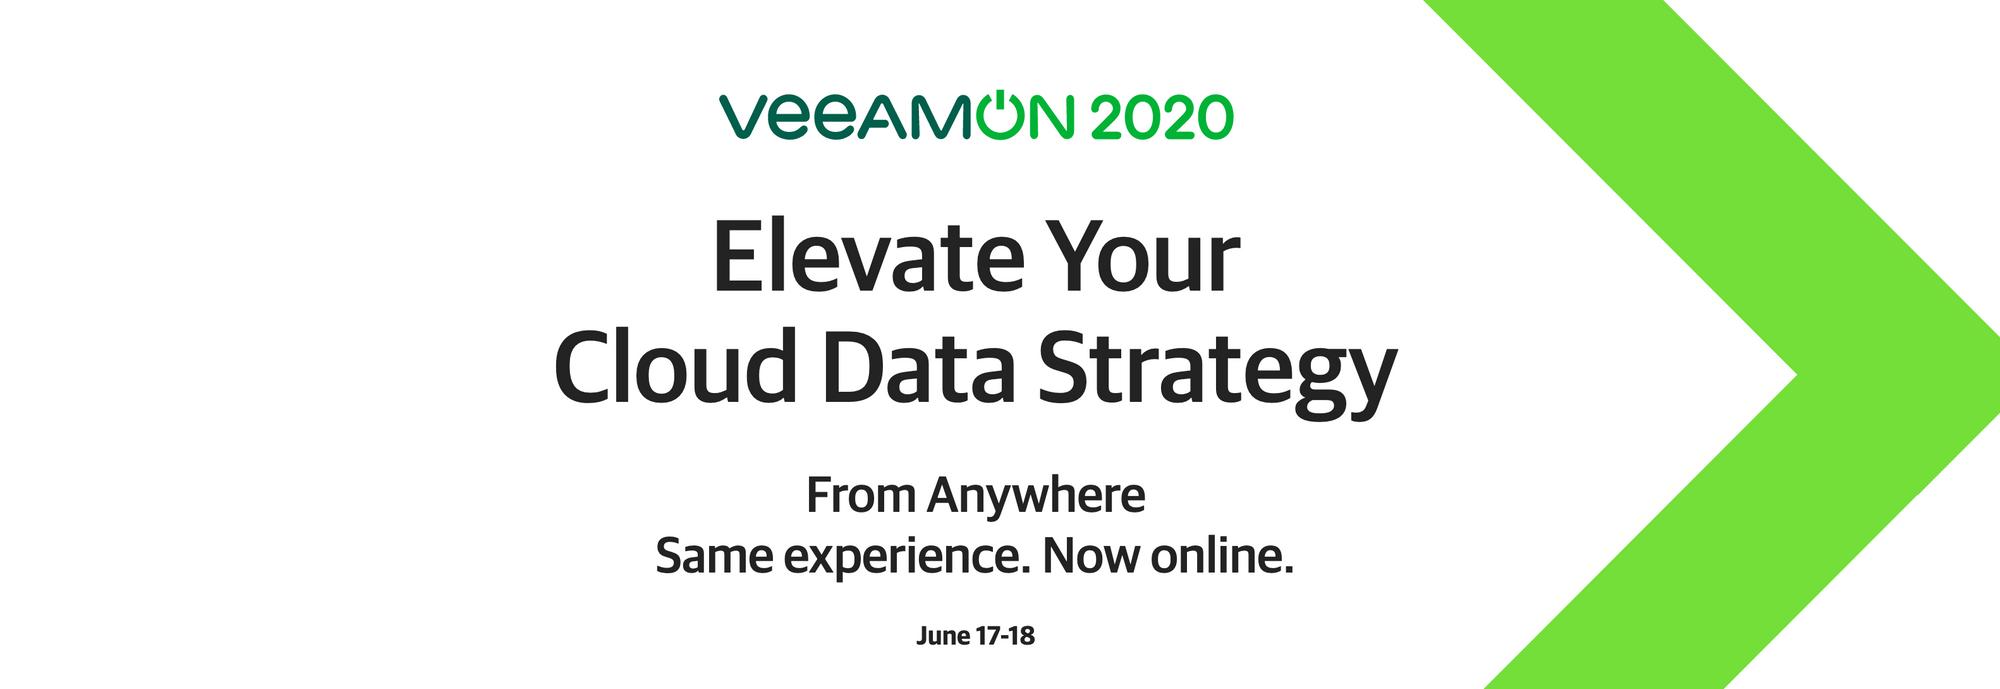 VeeamON 2020 Agenda Speakers and Sessions